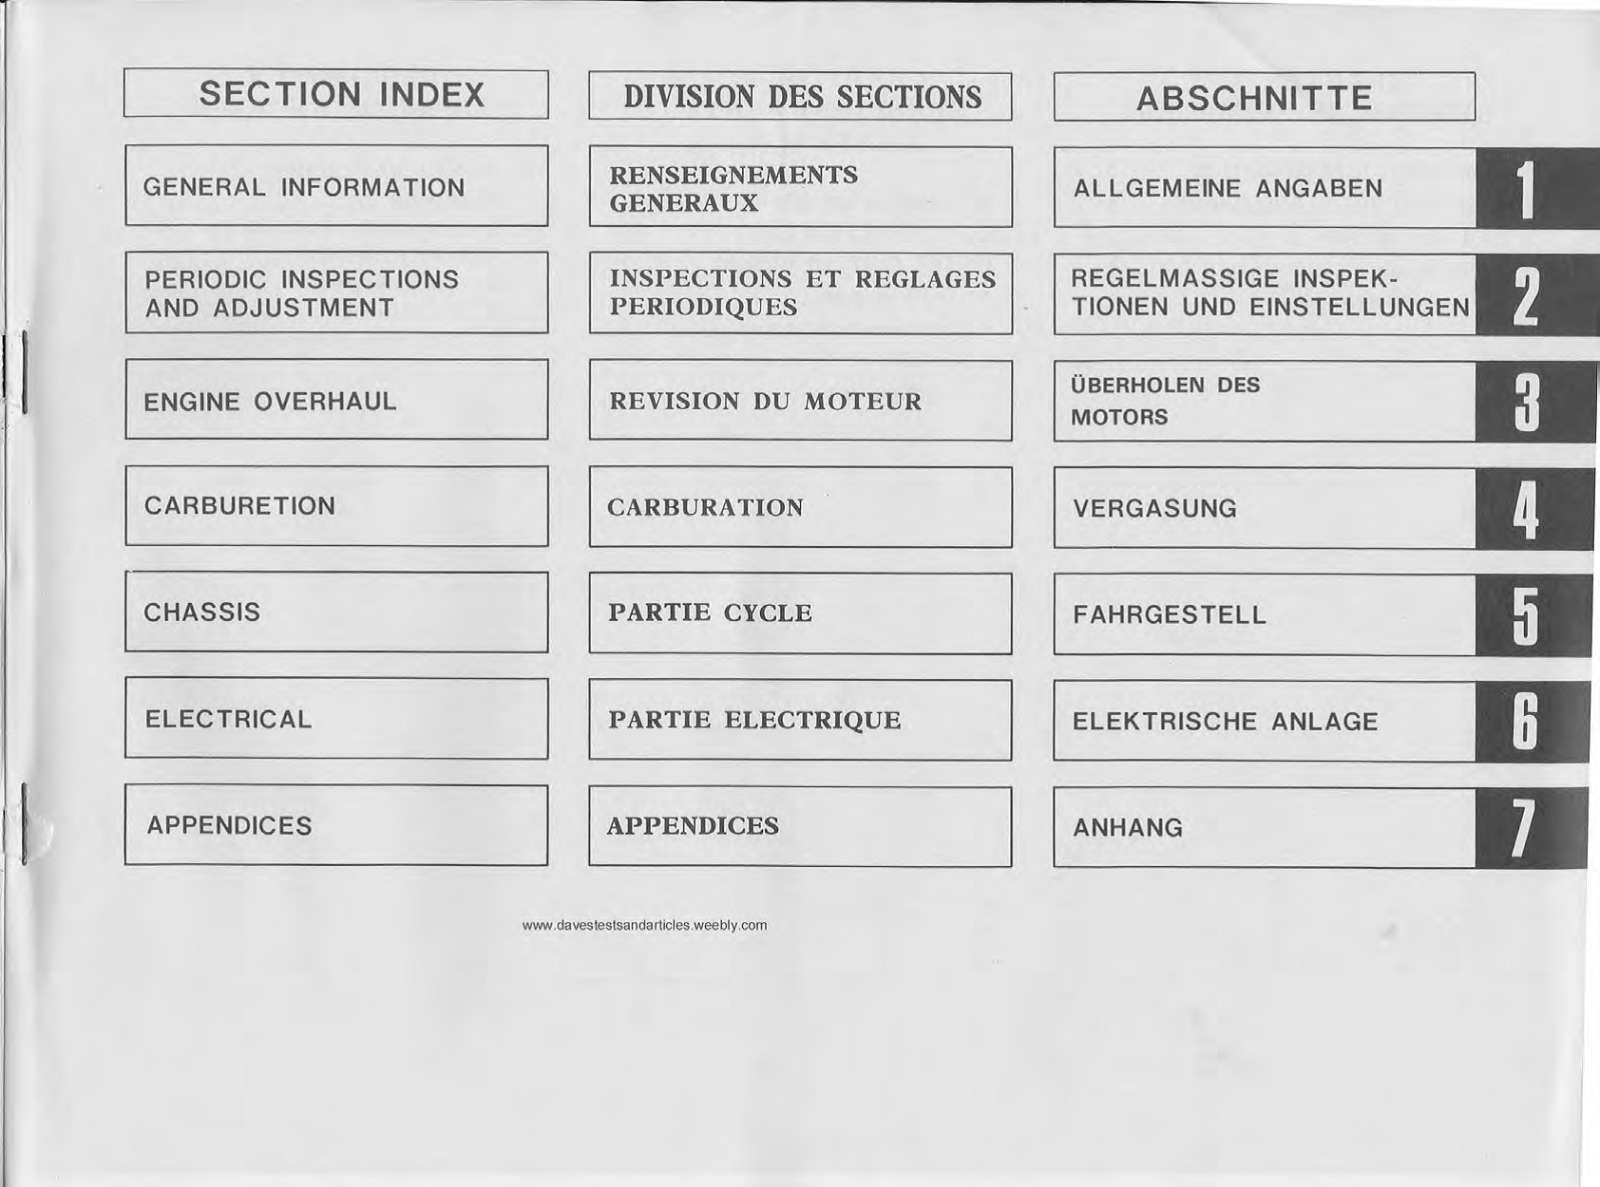 Yamaha Dt 175 E Service Manual Manuel Datelier Wartungsanleitung Yg1 Wiring Diagram 1 Of 4 Workshop 79